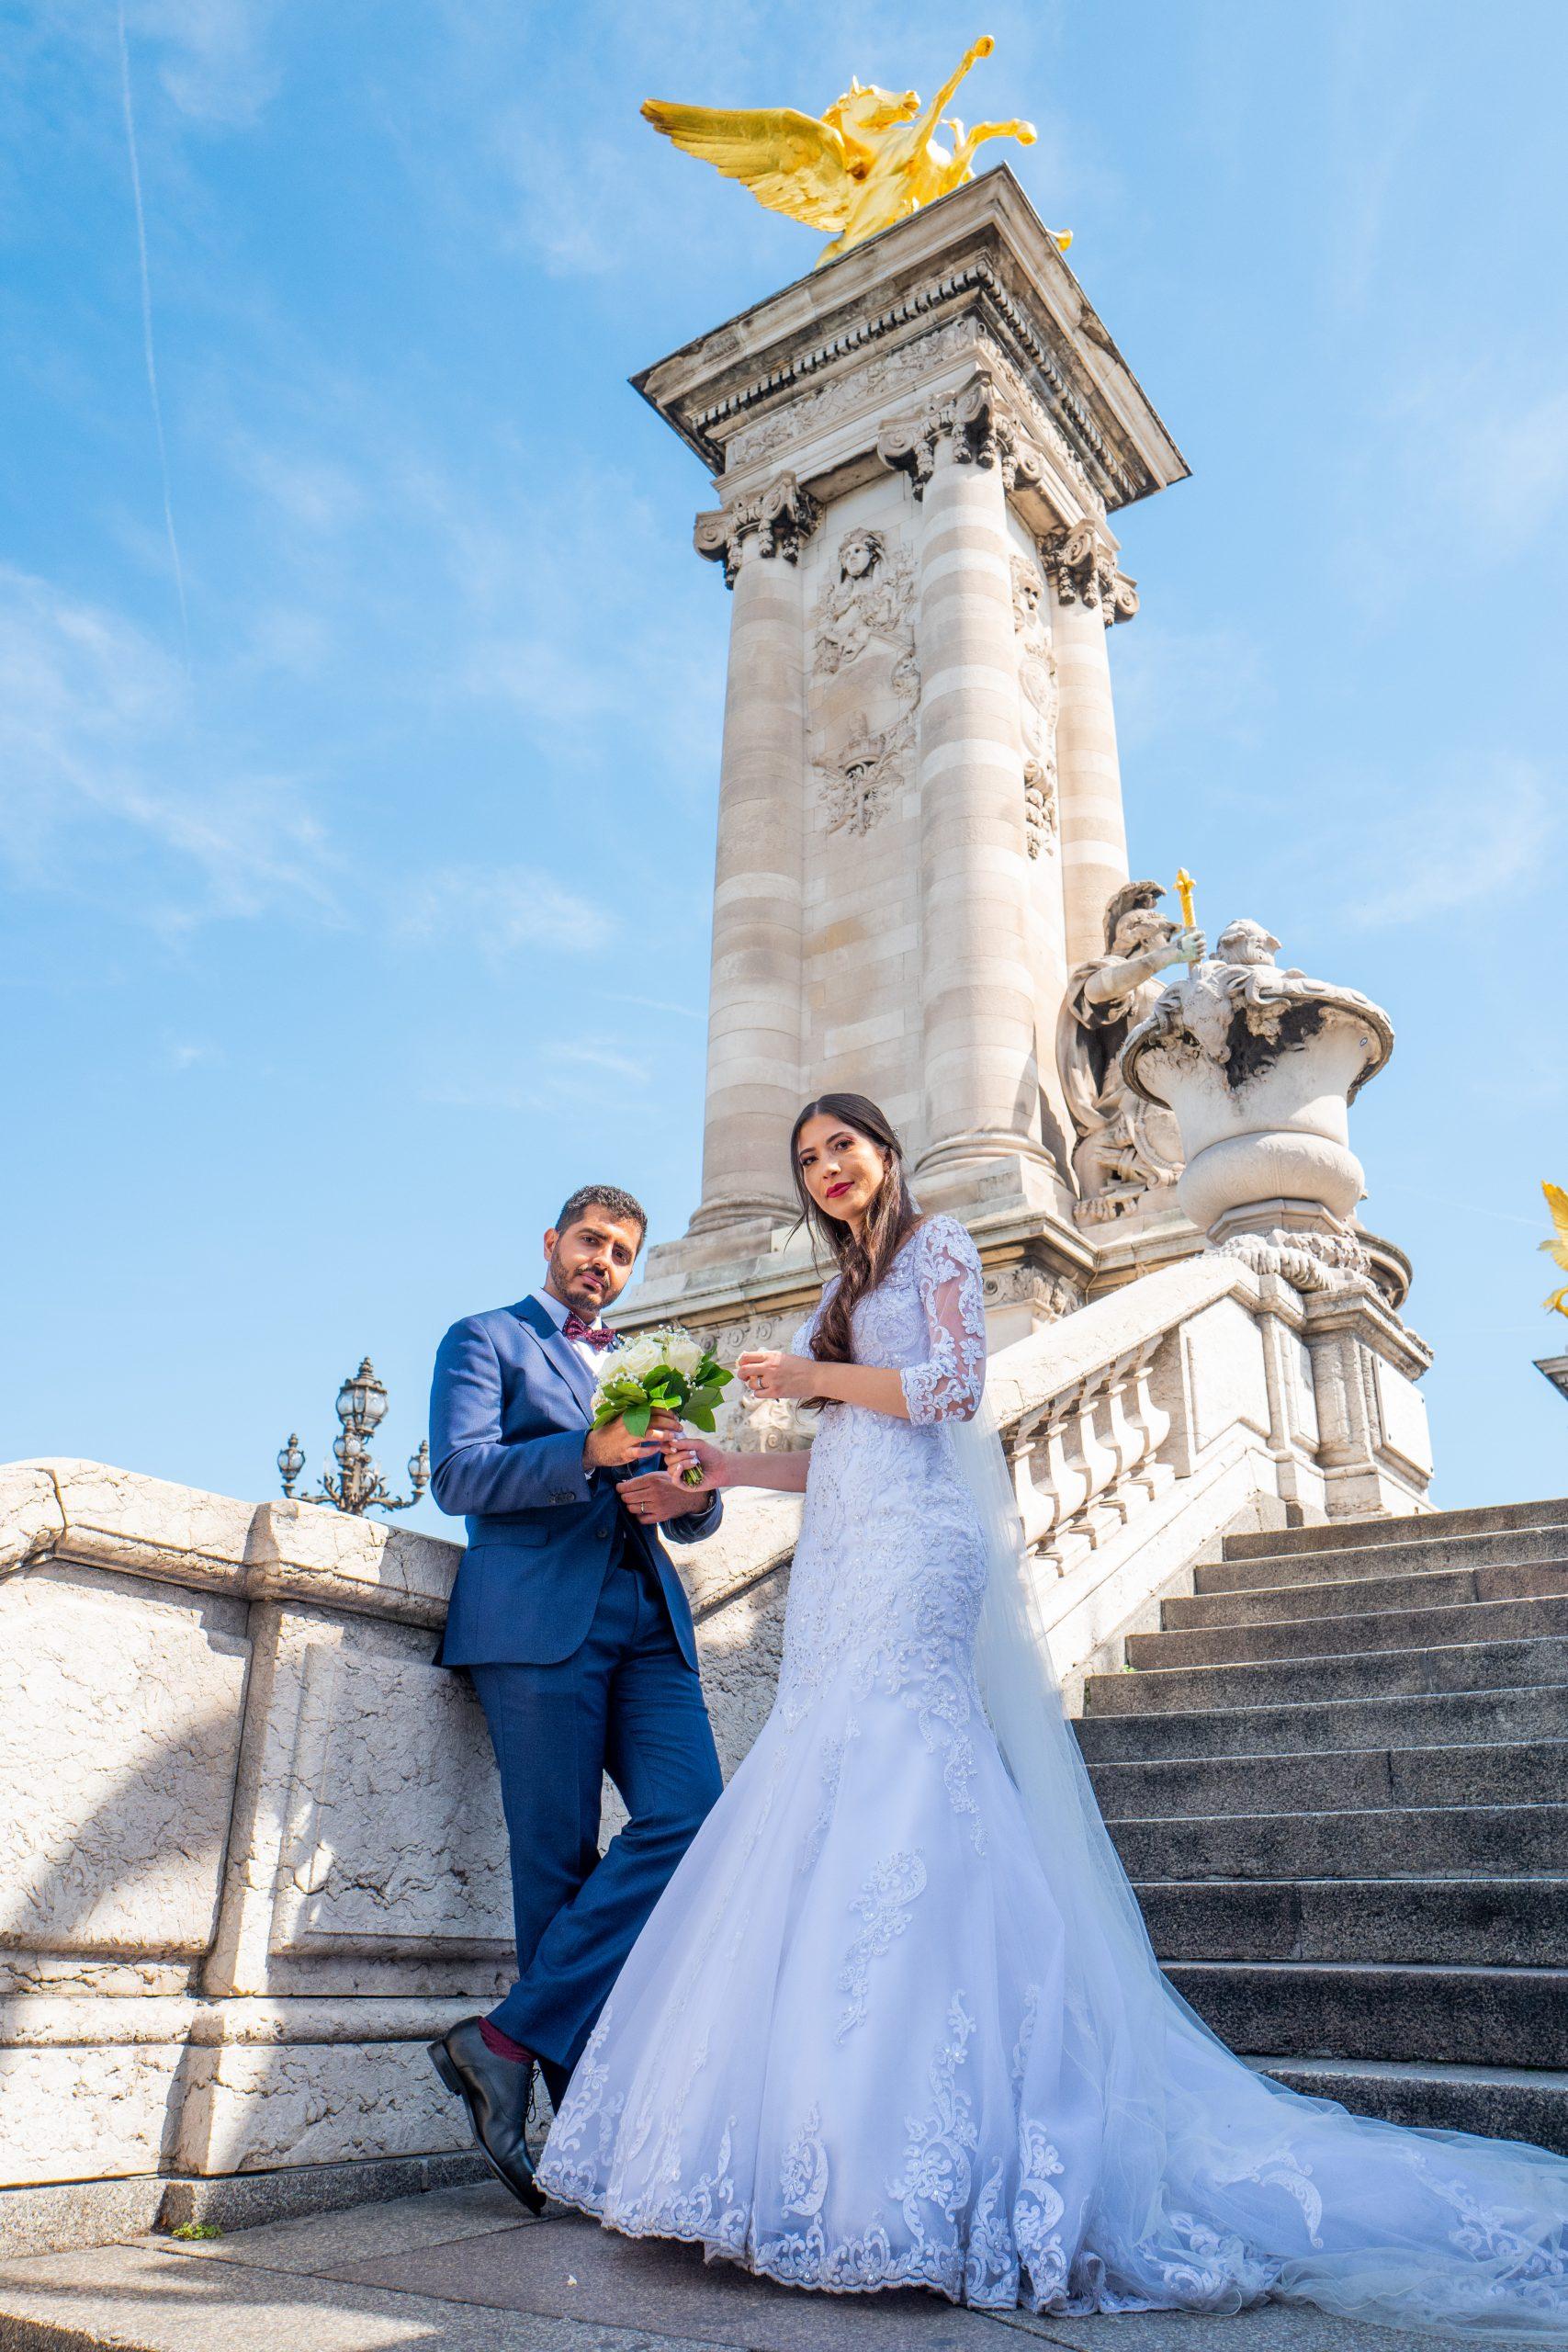 Mariage Paris - Photographe mariage Paris original - Séance couple - Pont Alexandre III -